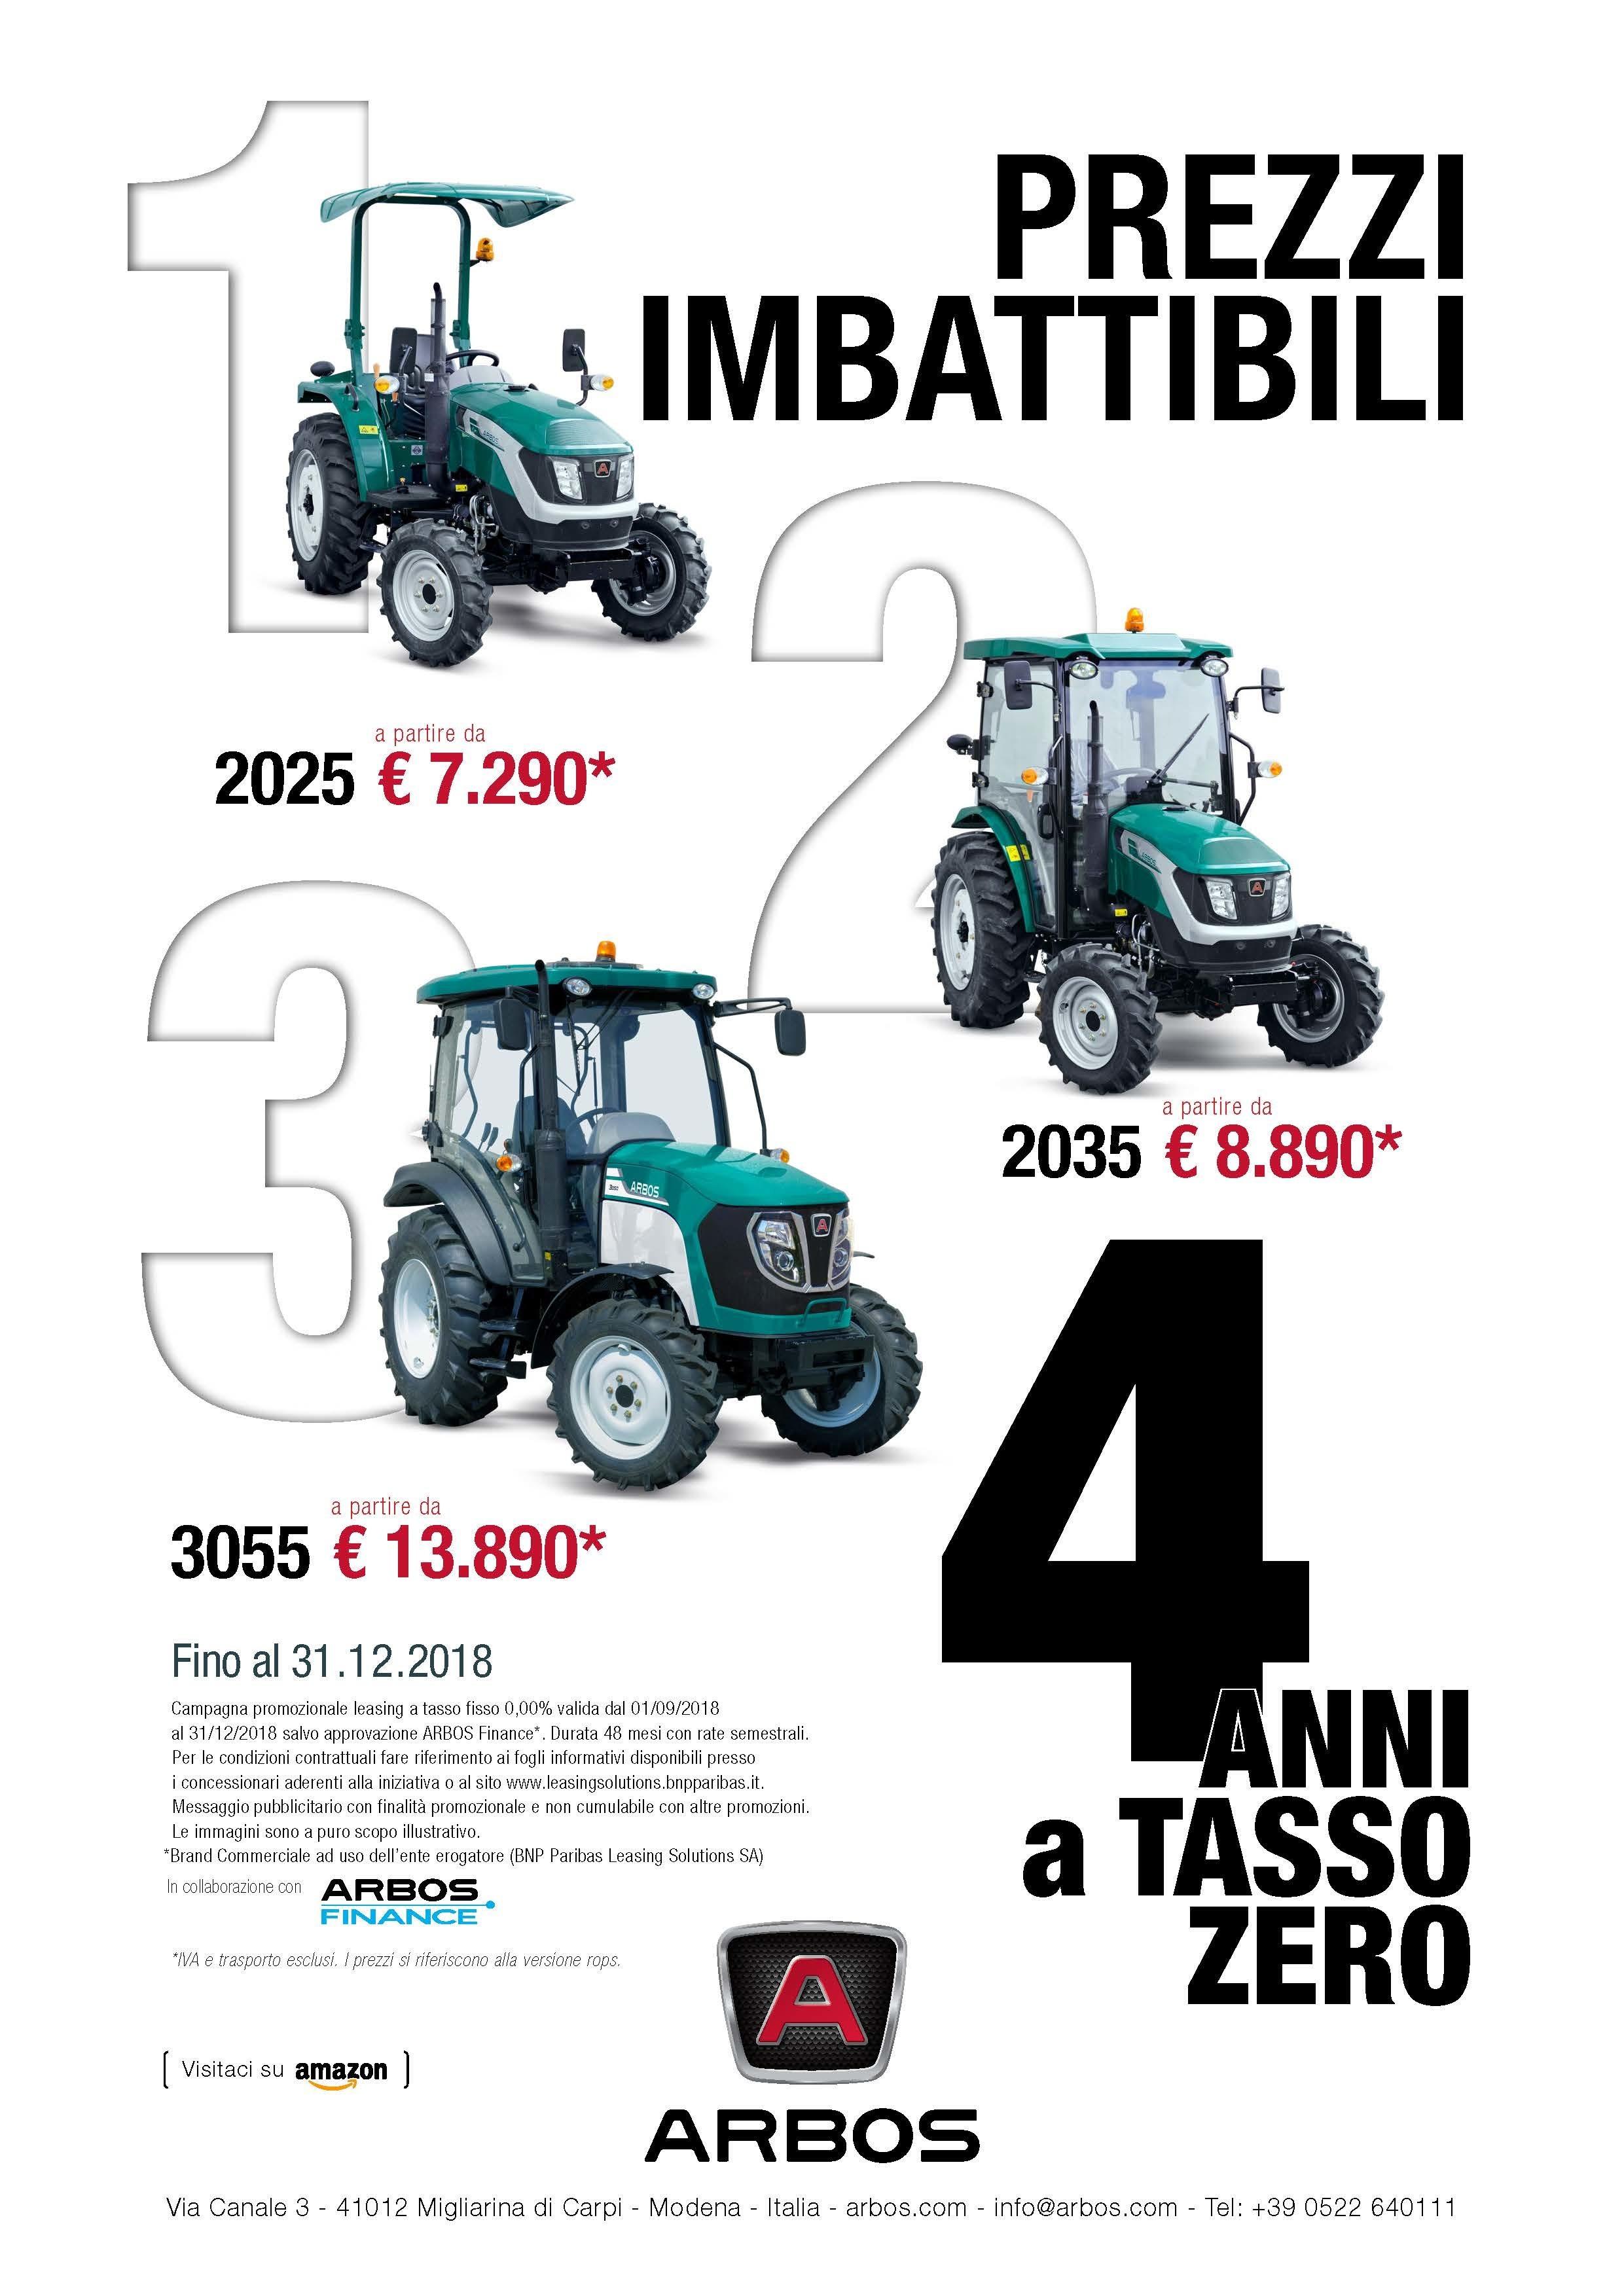 Prezzi imbattibili - promo ARBOS SERIE 2000 E 3000.jpg